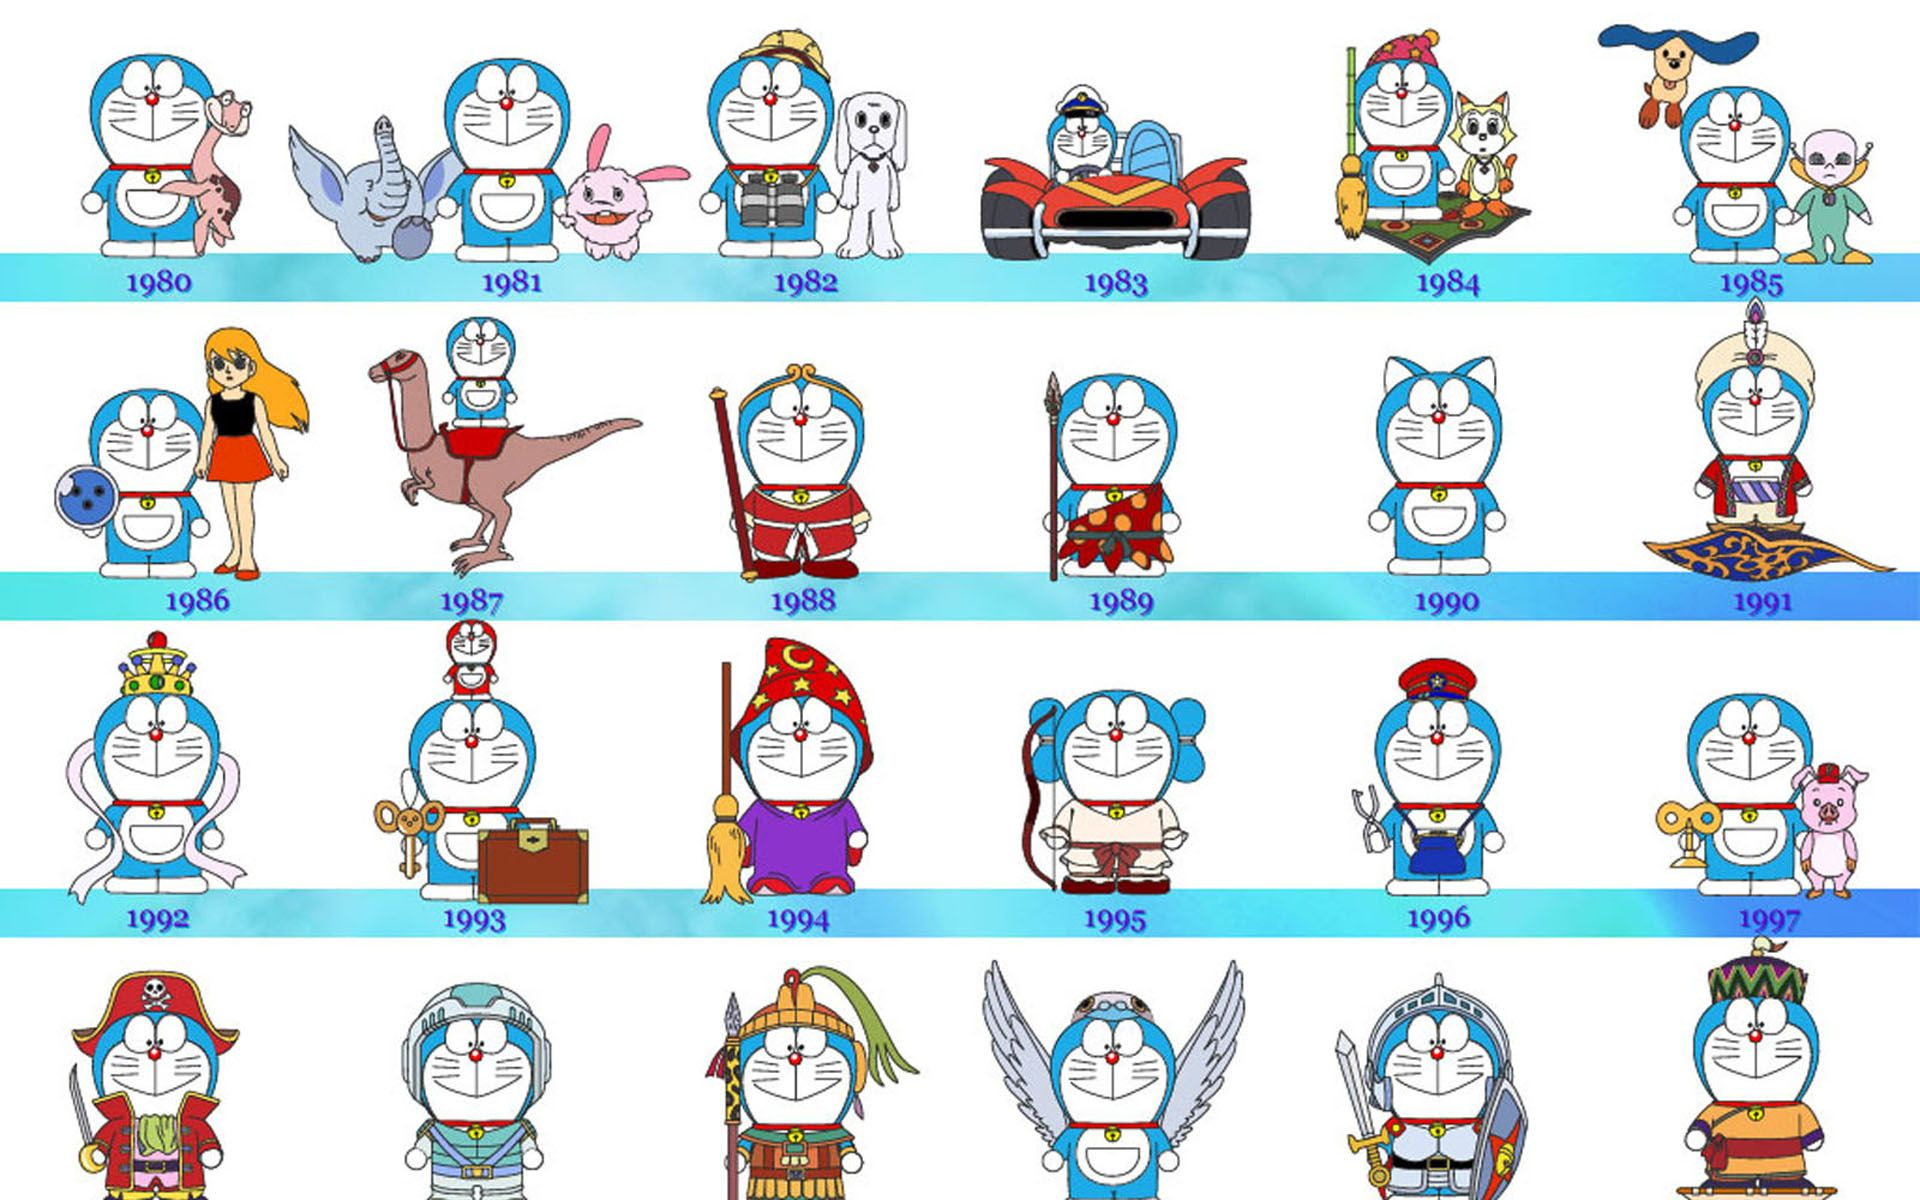 Download wallpaper doraemon free - Image For 28 Characters Doraemon Hd Wallpaper